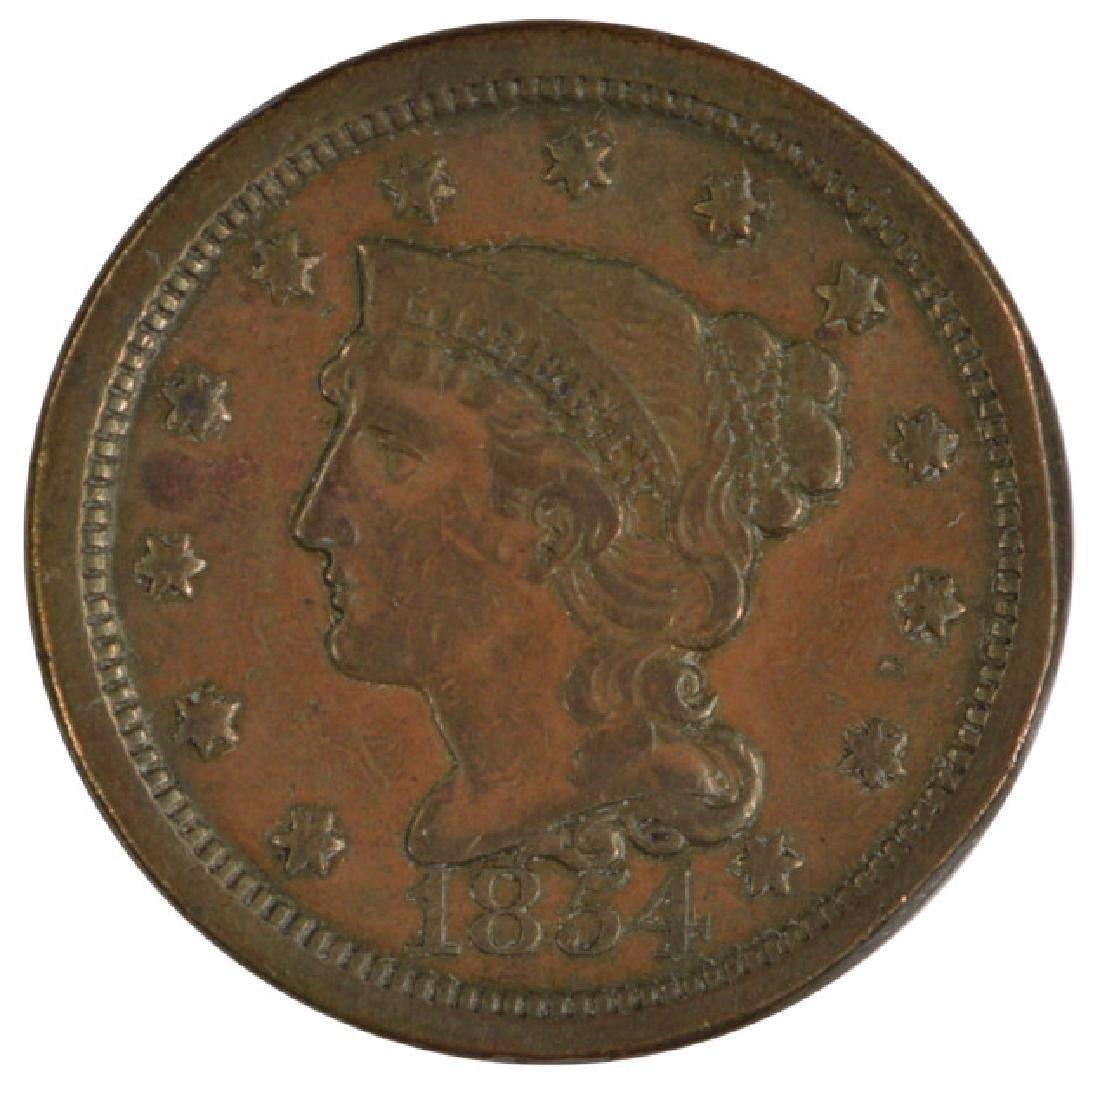 1854 Braided Hair Large Cent Coin